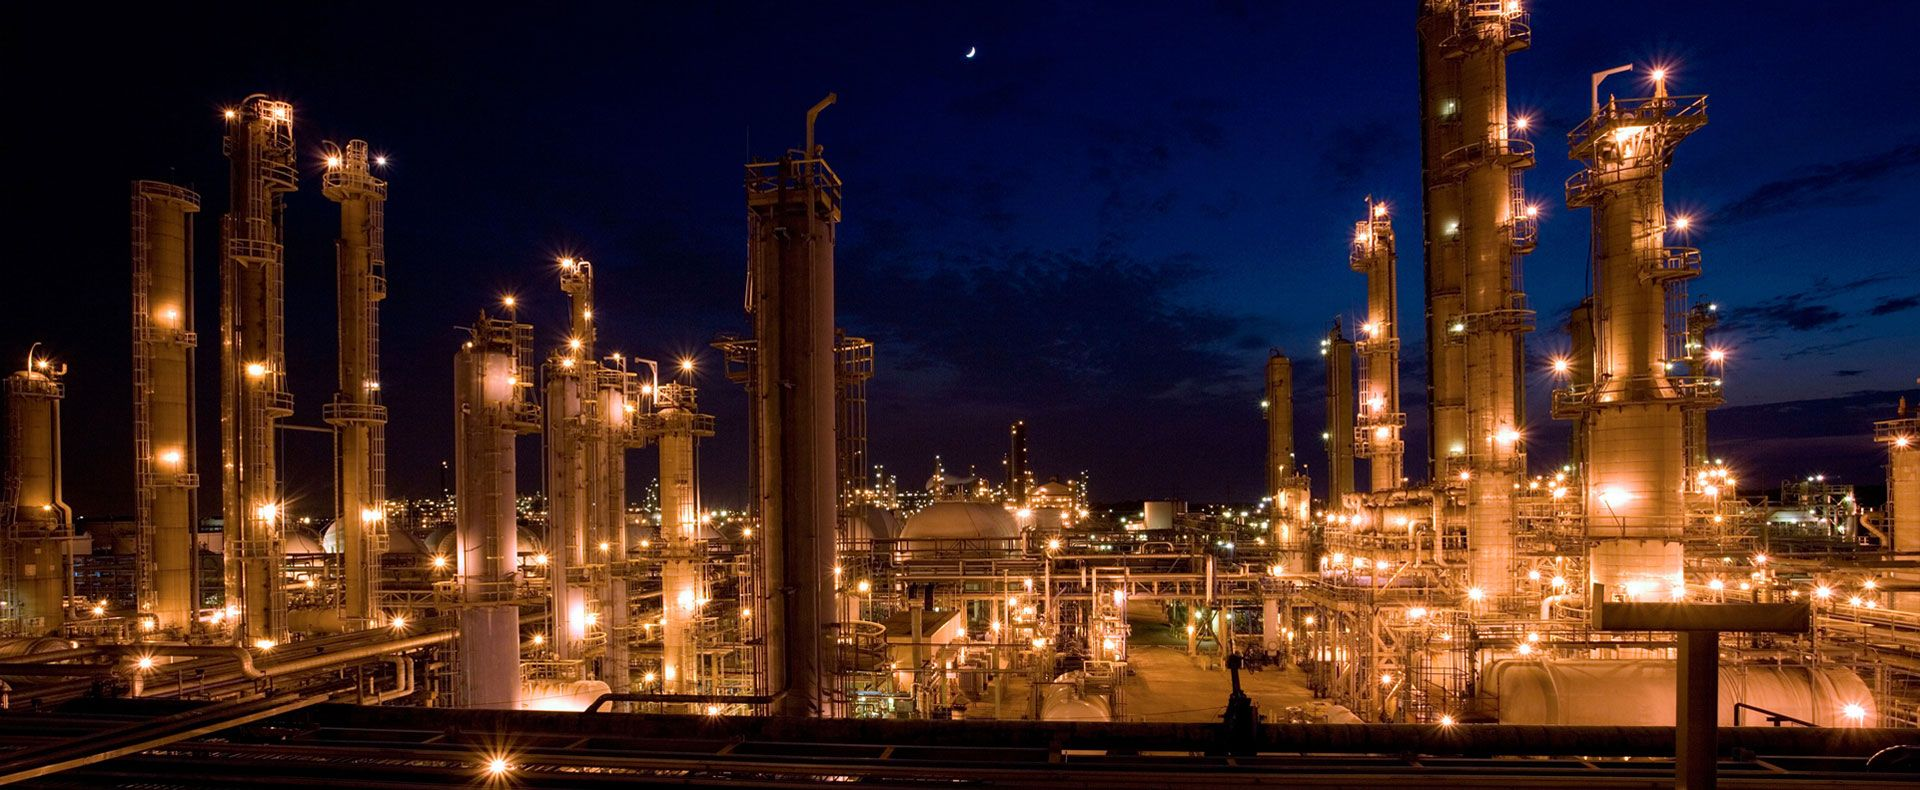 LyondellBasell Industries | LyondellBasell